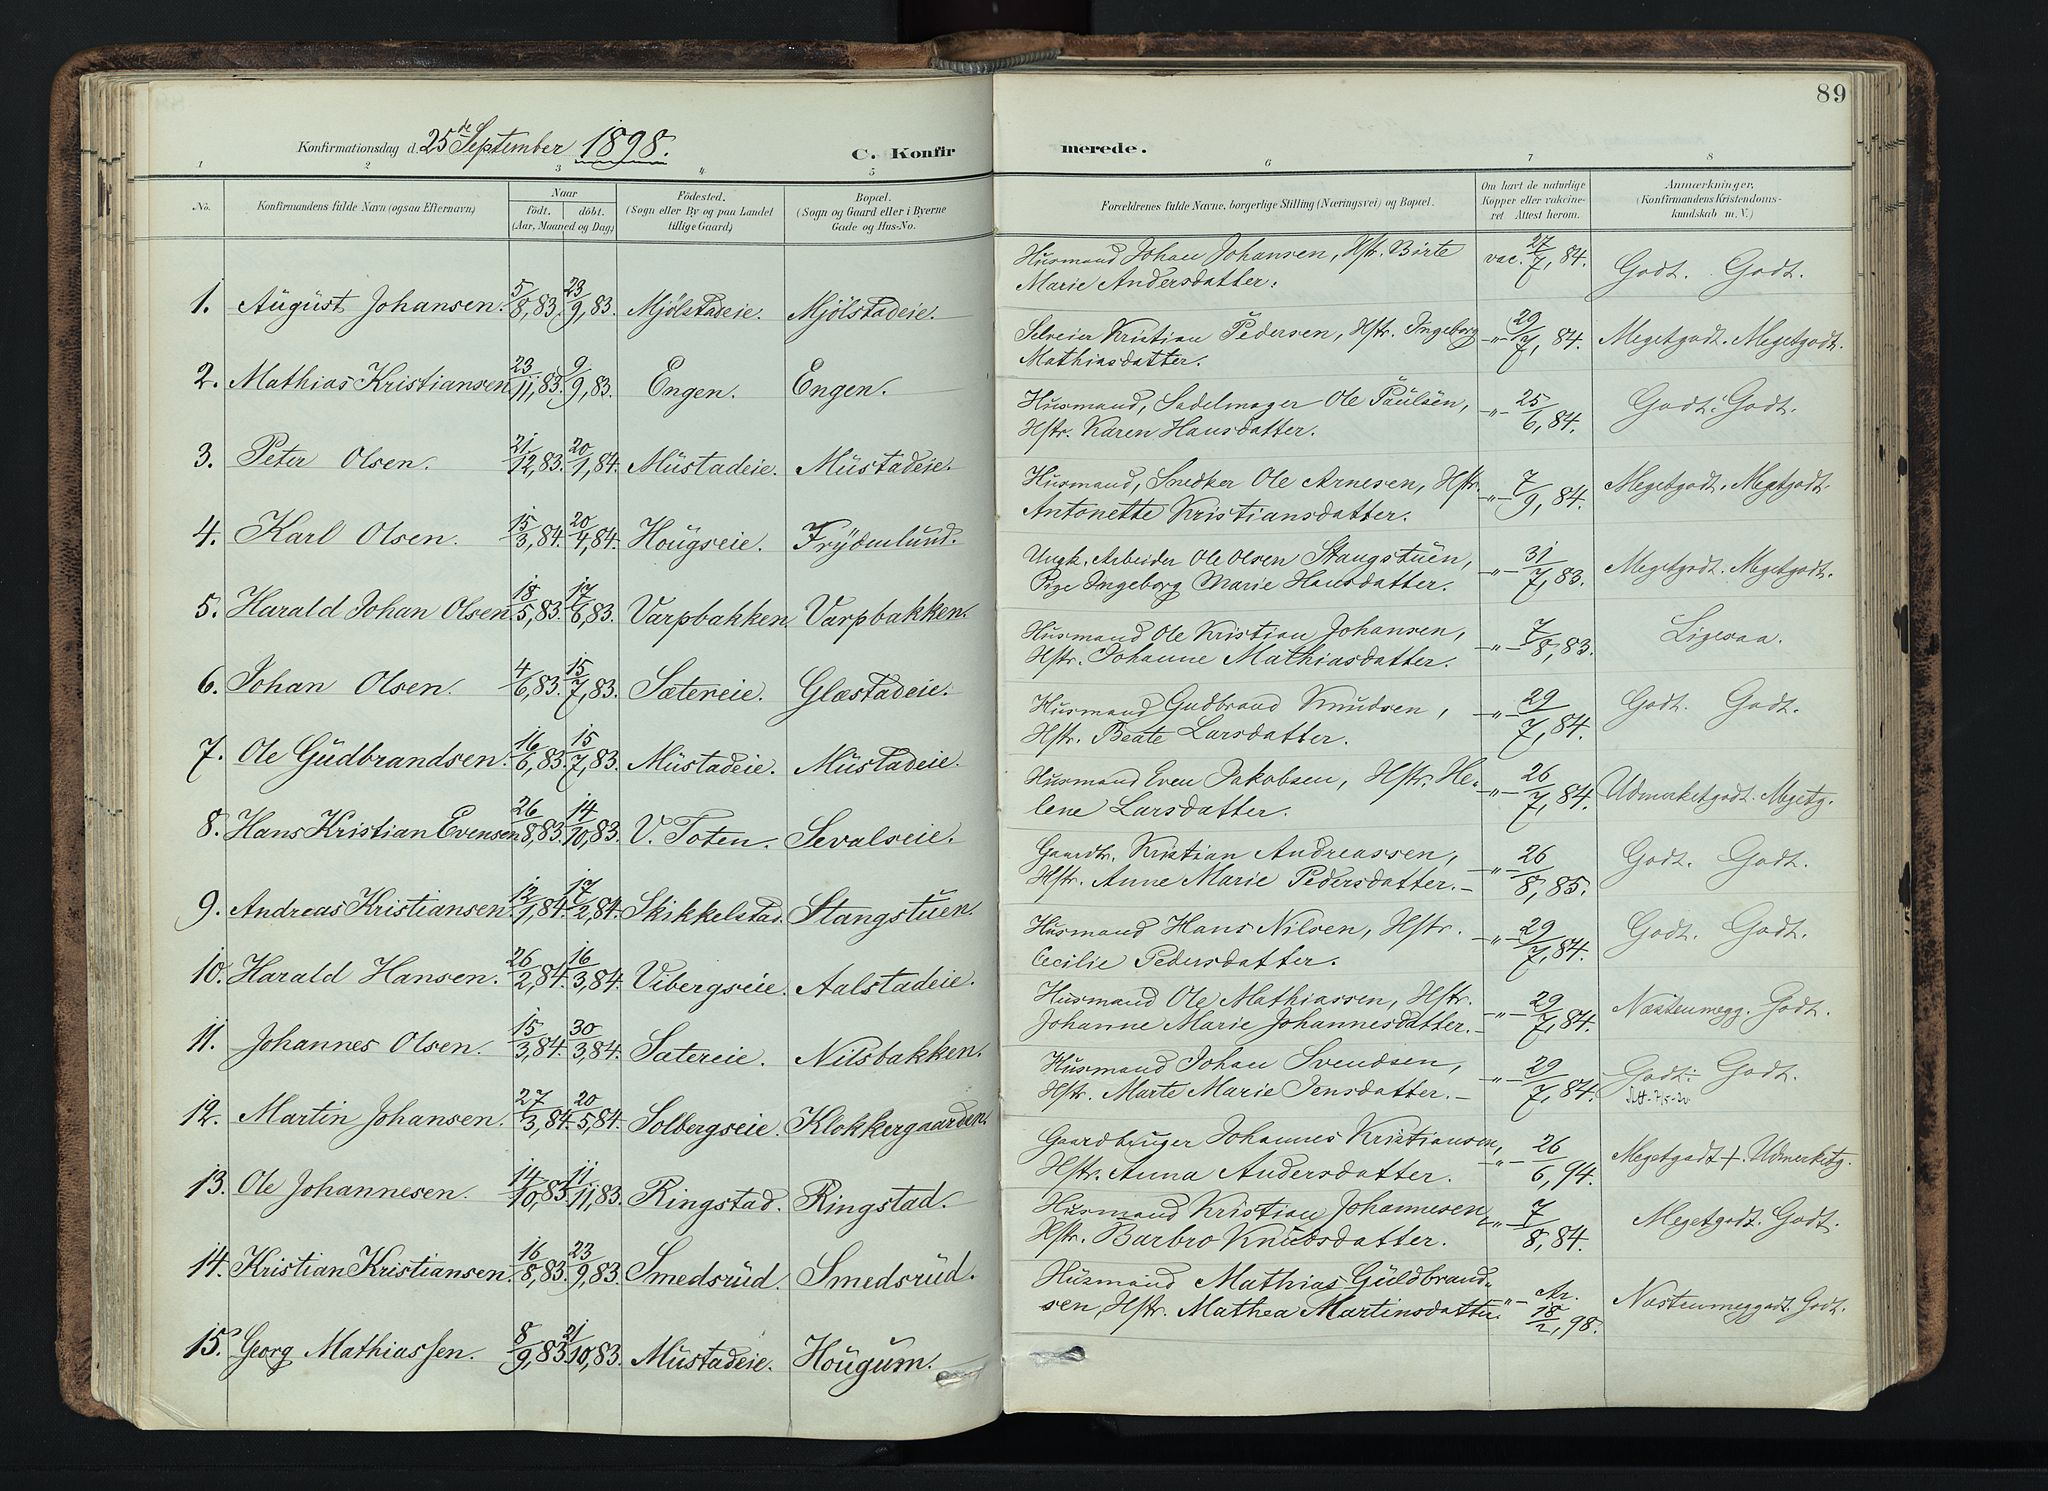 SAH, Vardal prestekontor, H/Ha/Haa/L0019: Ministerialbok nr. 19, 1893-1907, s. 89